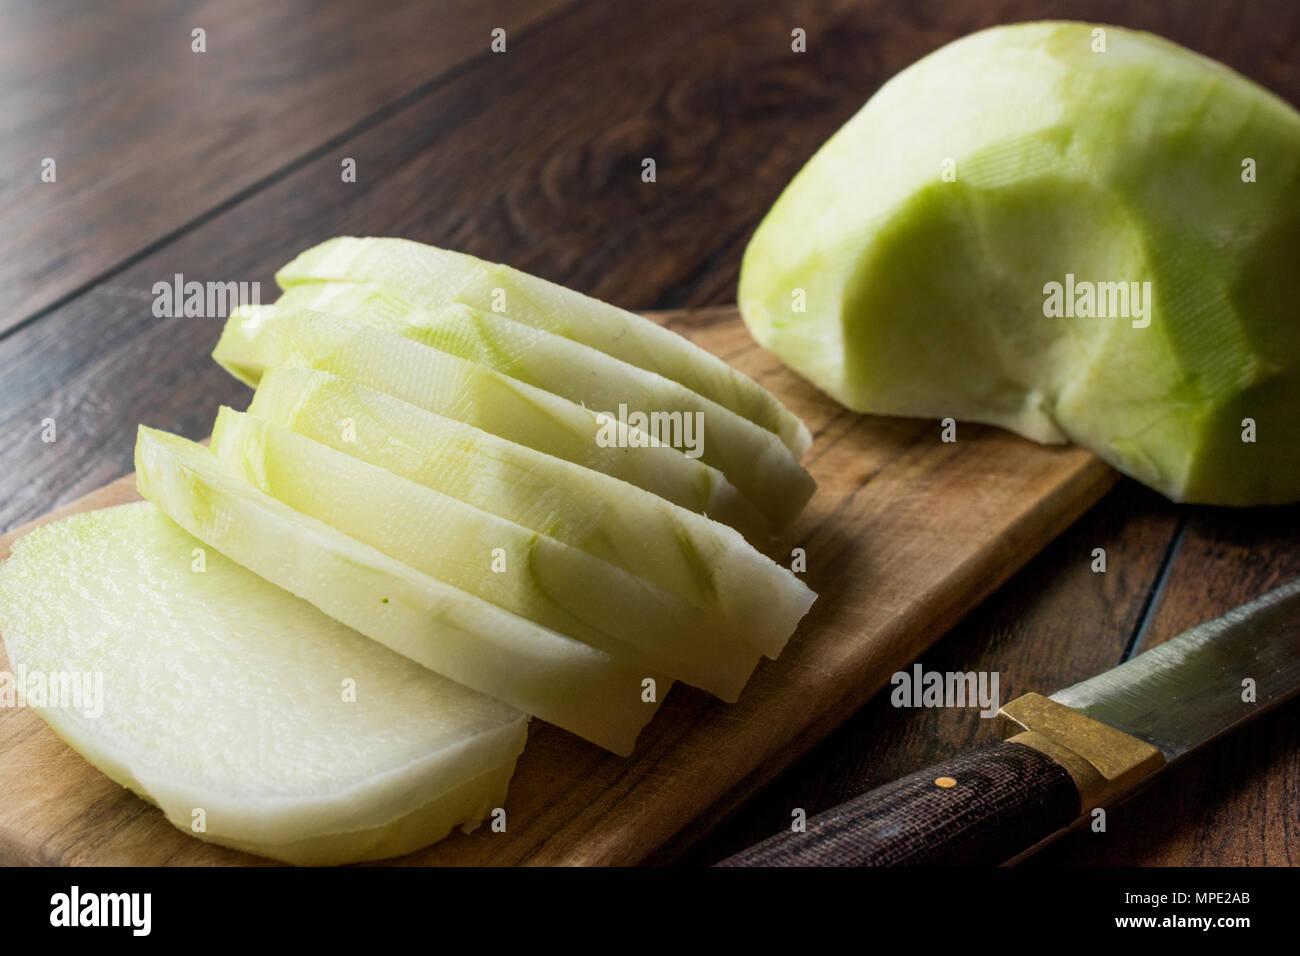 Sliced Turkish Alabas Turp / Organic Fresh Whole Radish Slices with Knife. Organic Food. - Stock Image